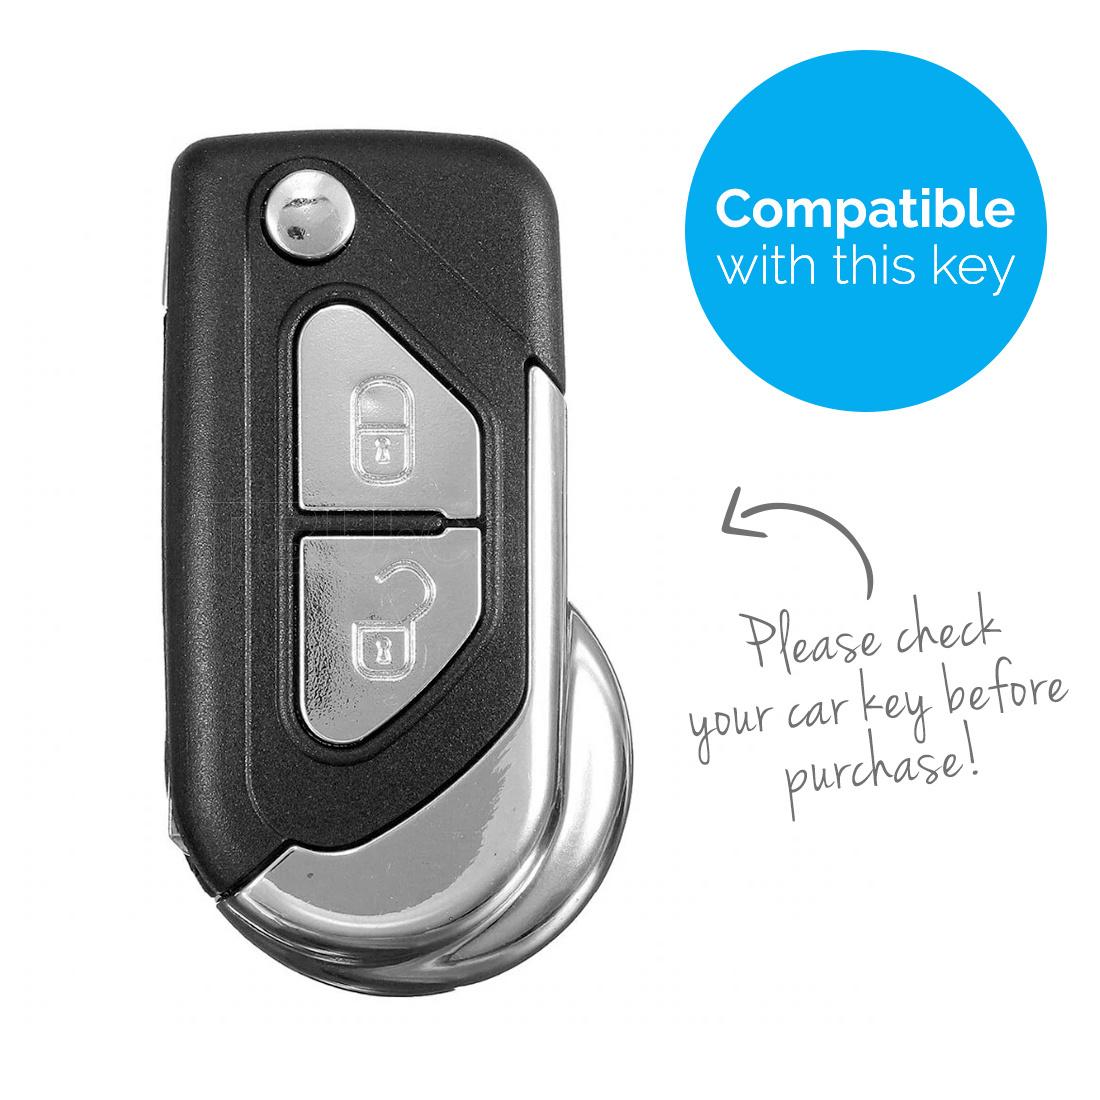 TBU car TBU car Autoschlüssel Hülle kompatibel mit Citroën 2 Tasten - Schutzhülle aus Silikon - Auto Schlüsselhülle Cover in Schwarz